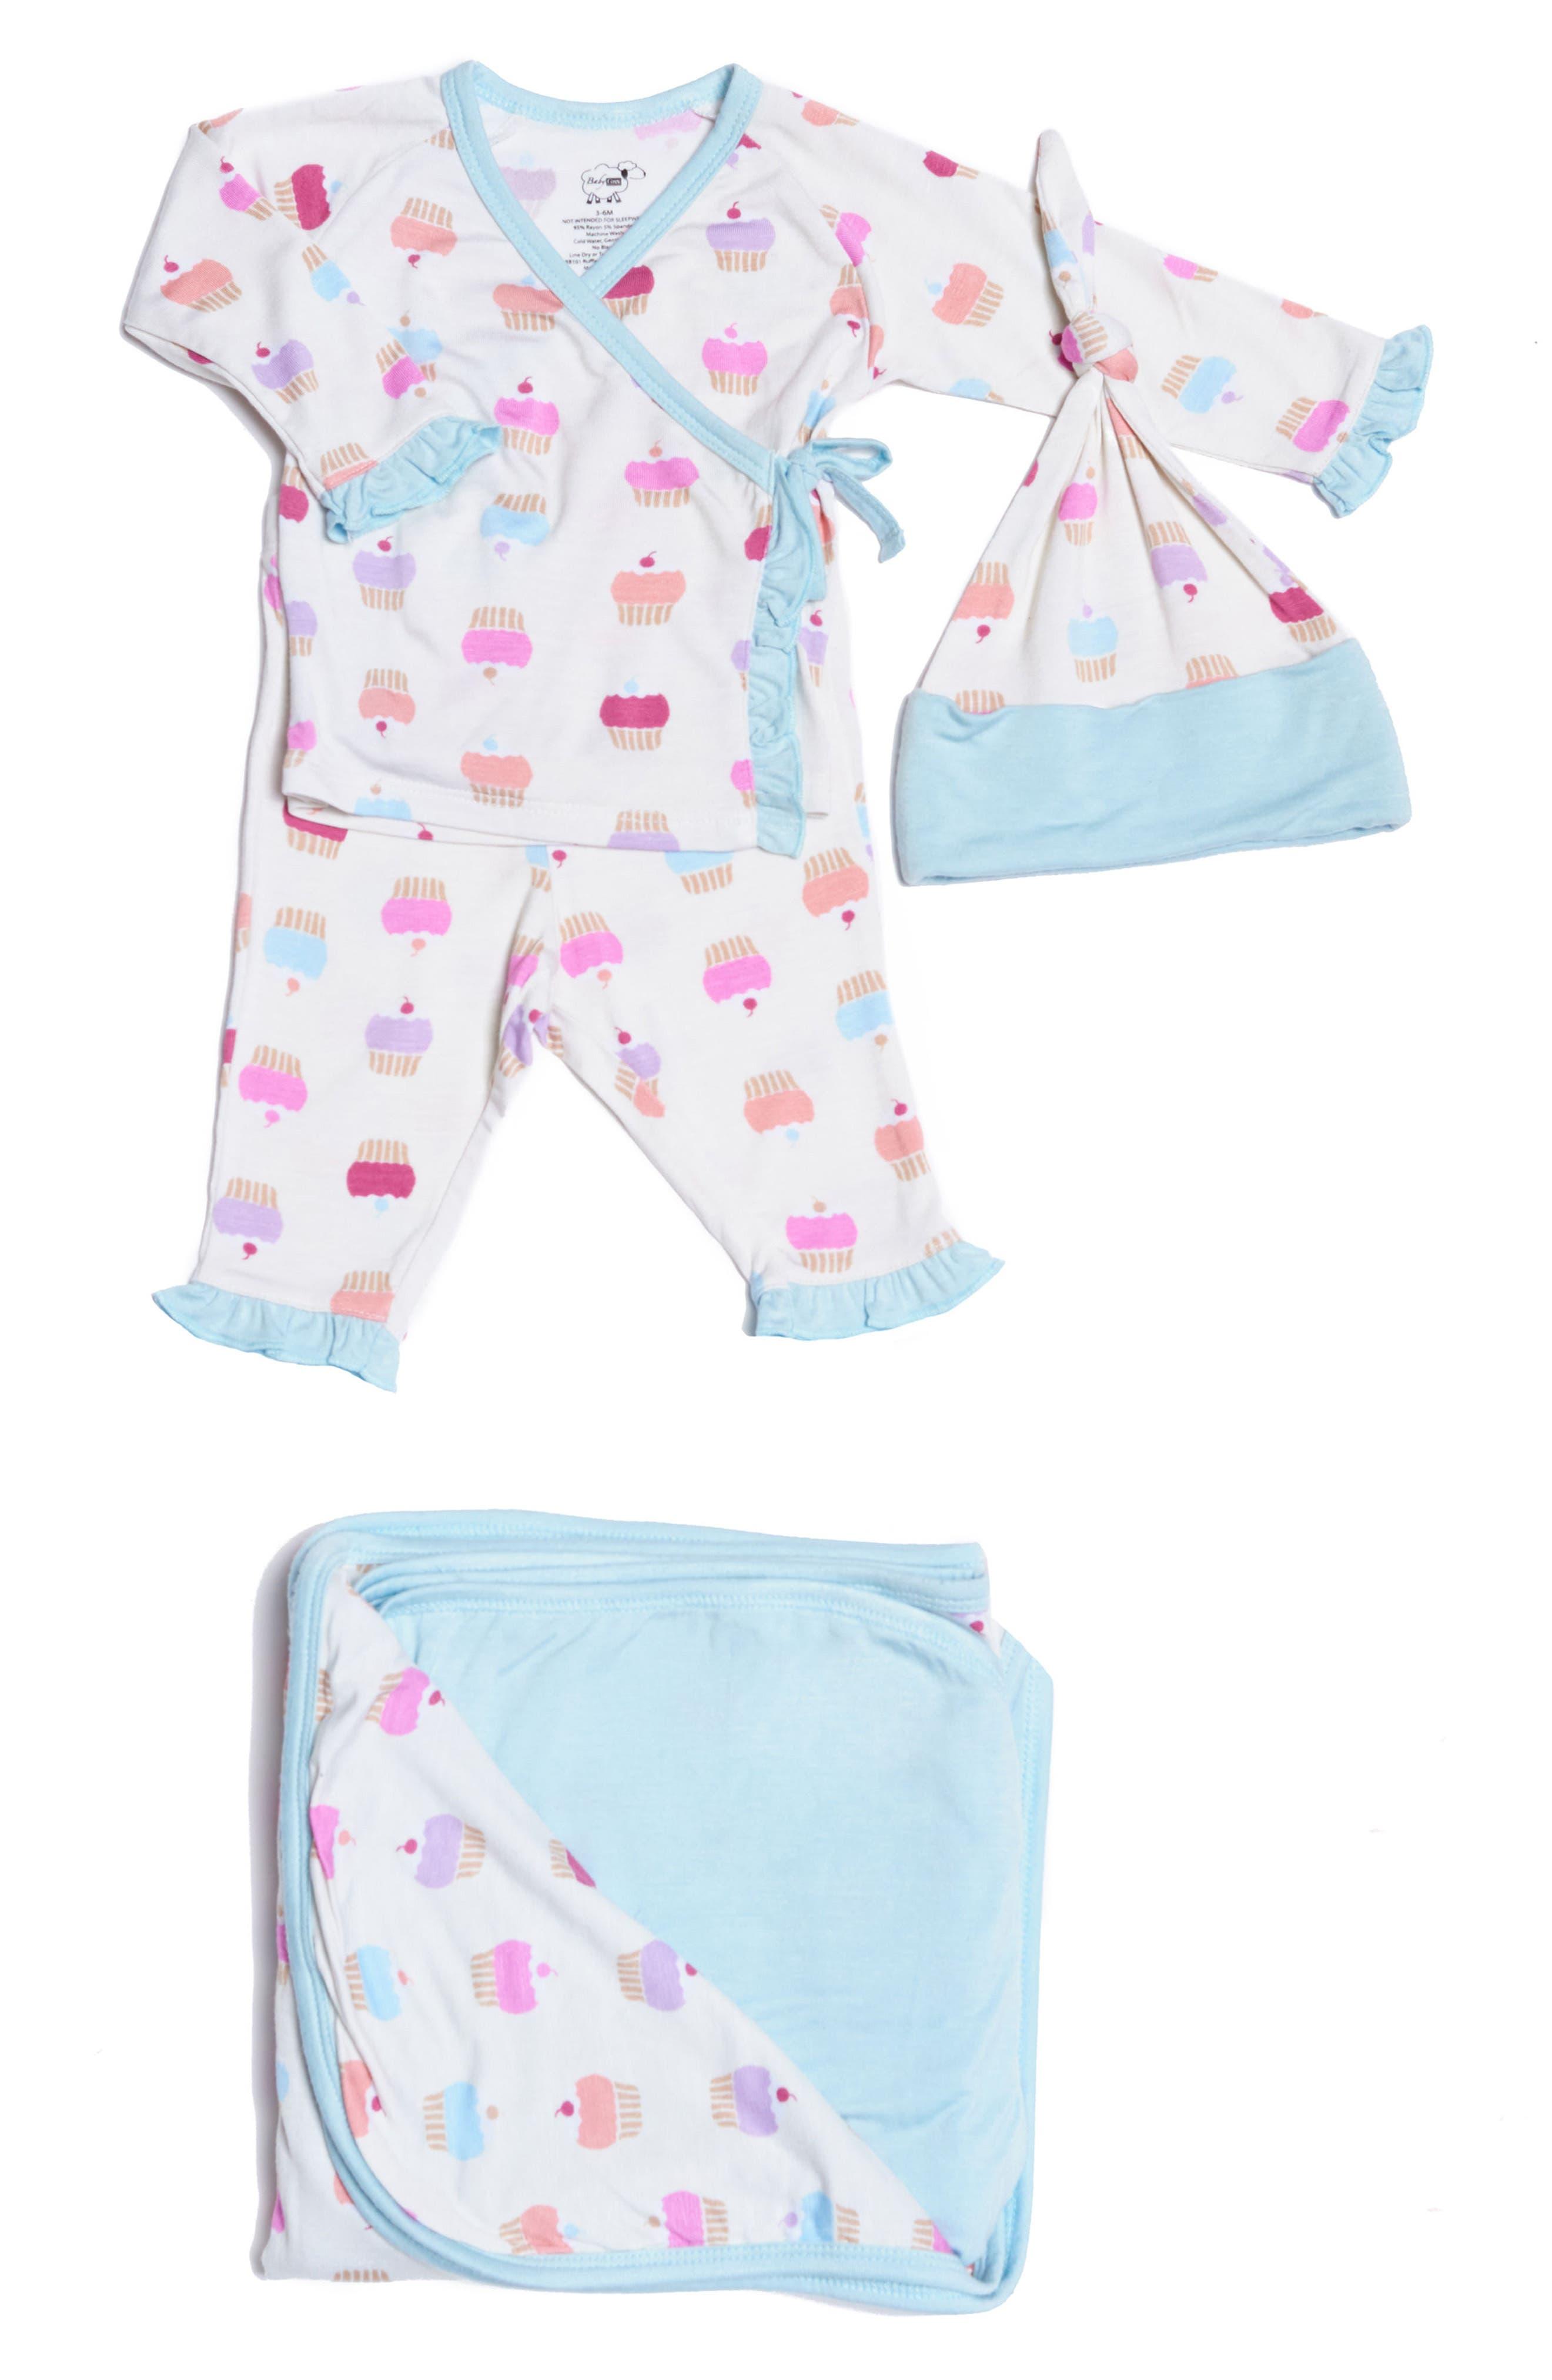 ,                             Ruffle Top, Pants, Hat & Blanket Set,                             Main thumbnail 1, color,                             CUPCAKES